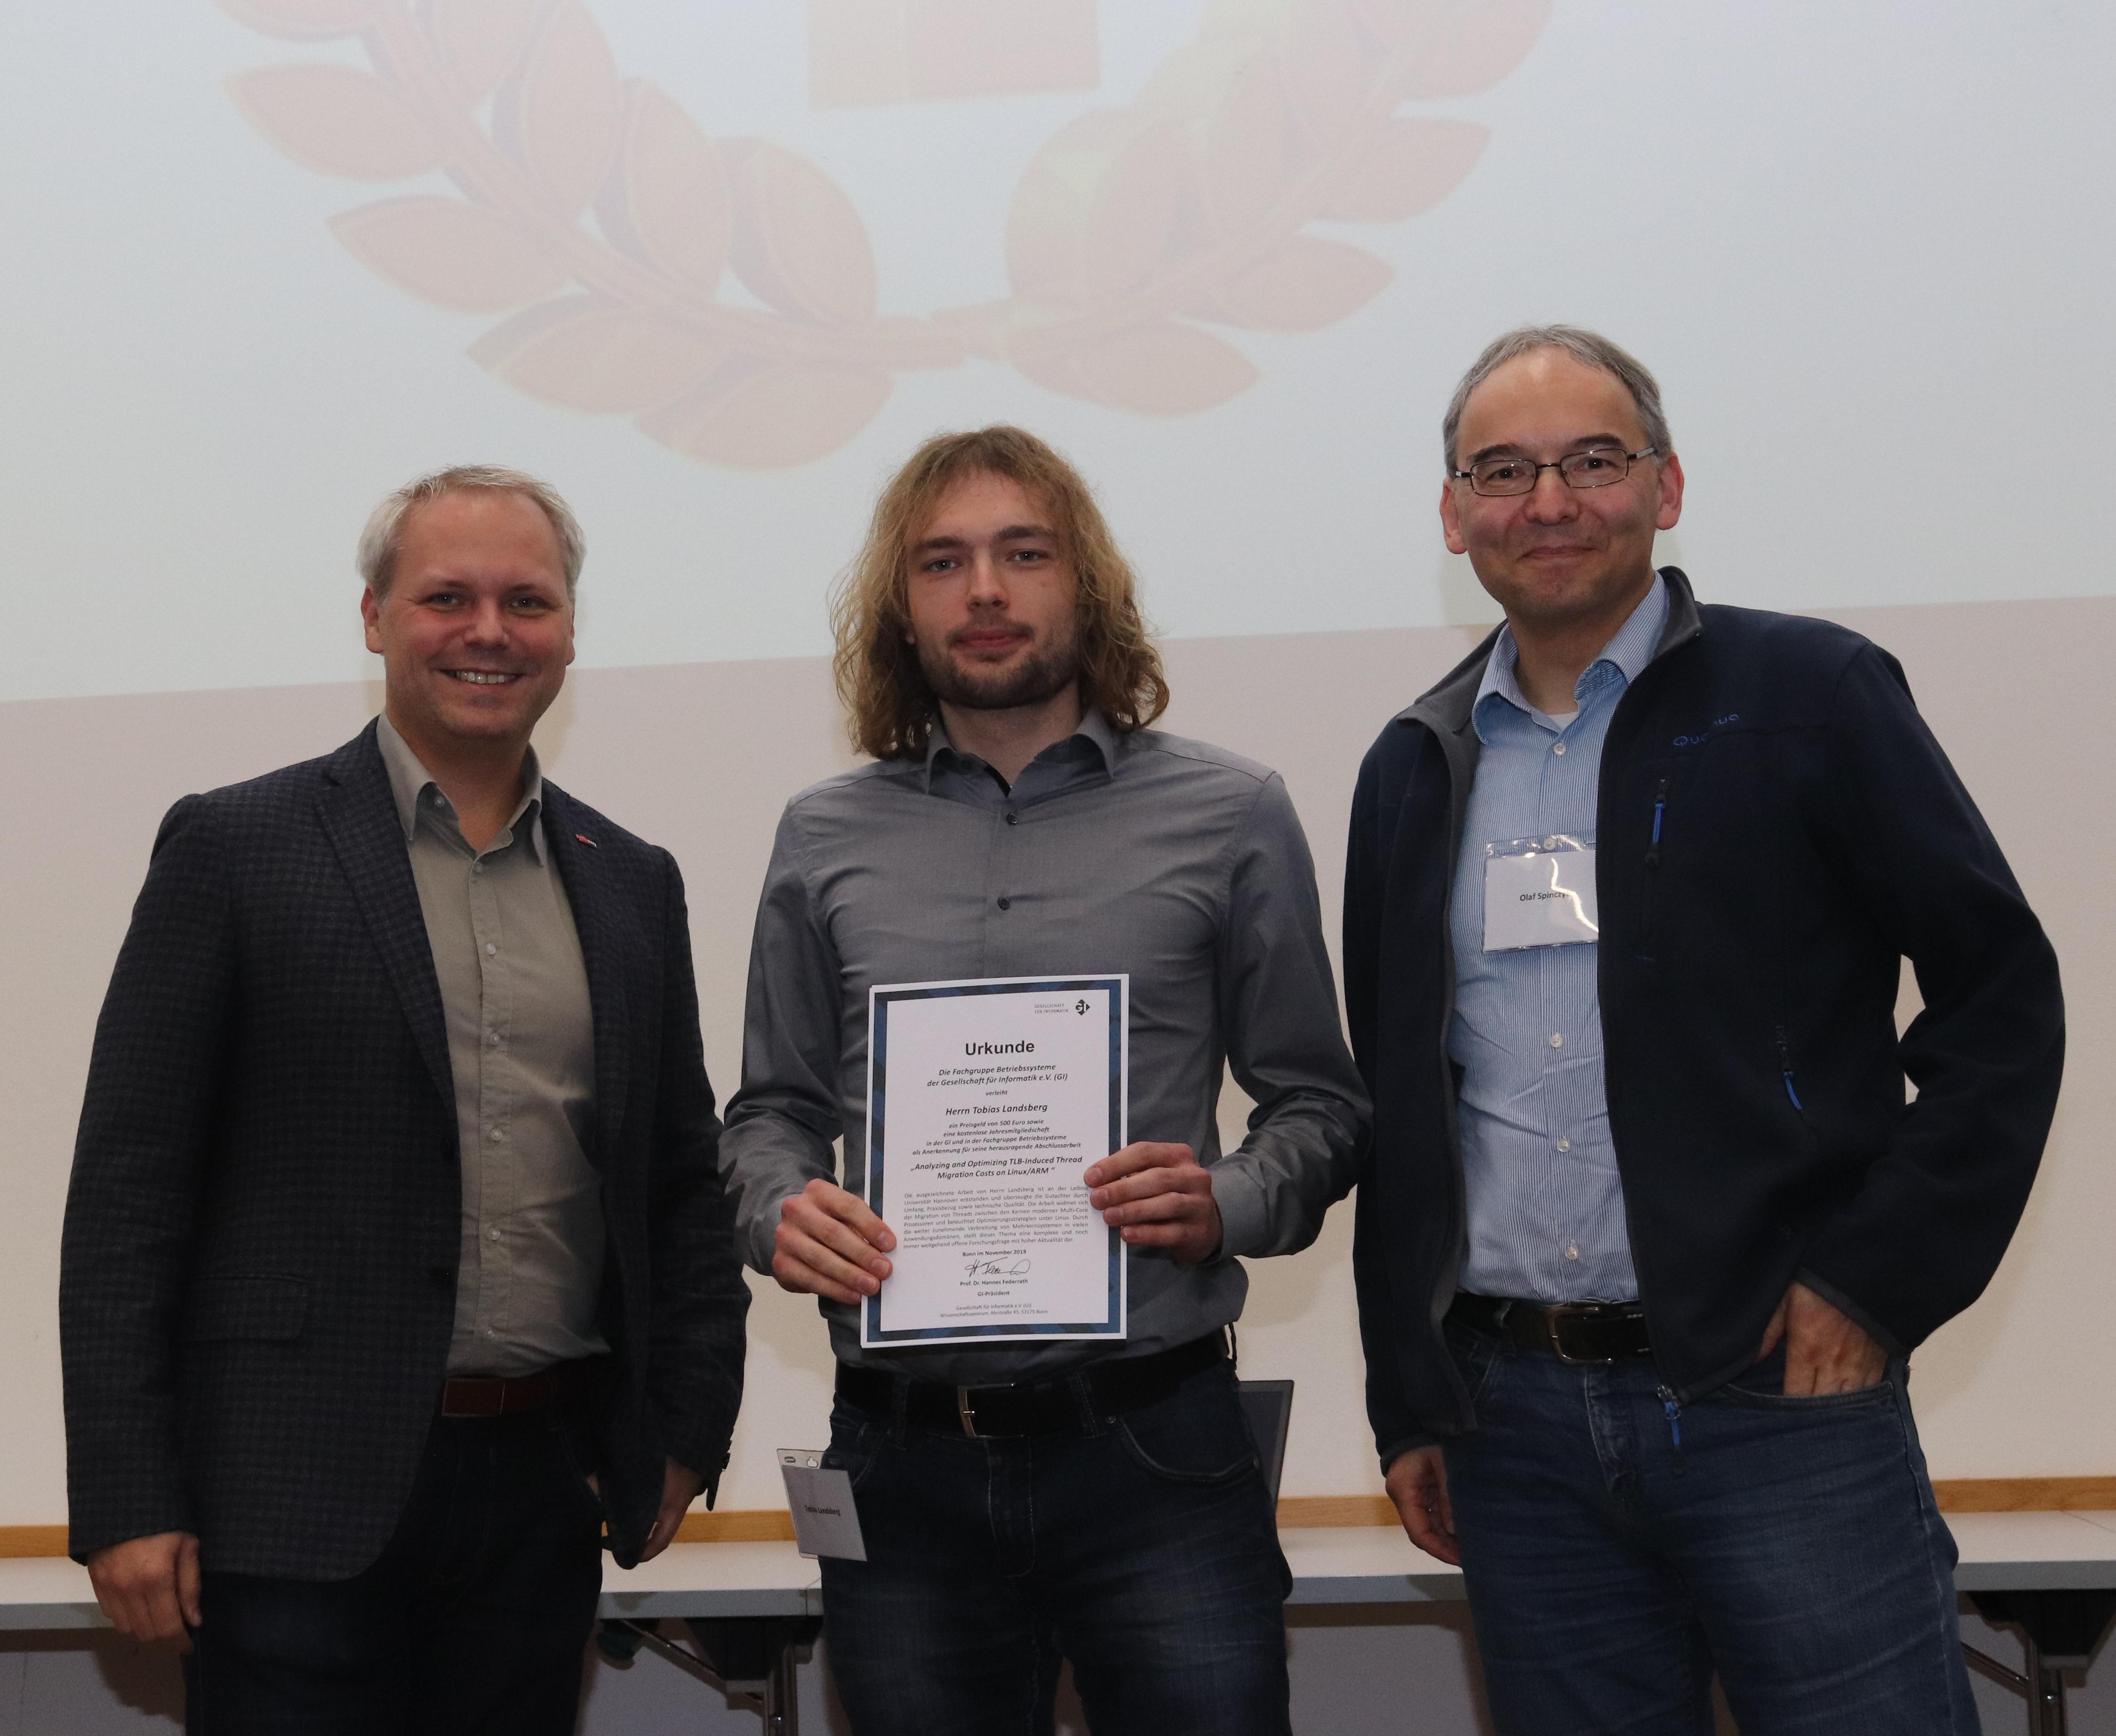 Preisträger des Absolventenpreises der Fachgruppe